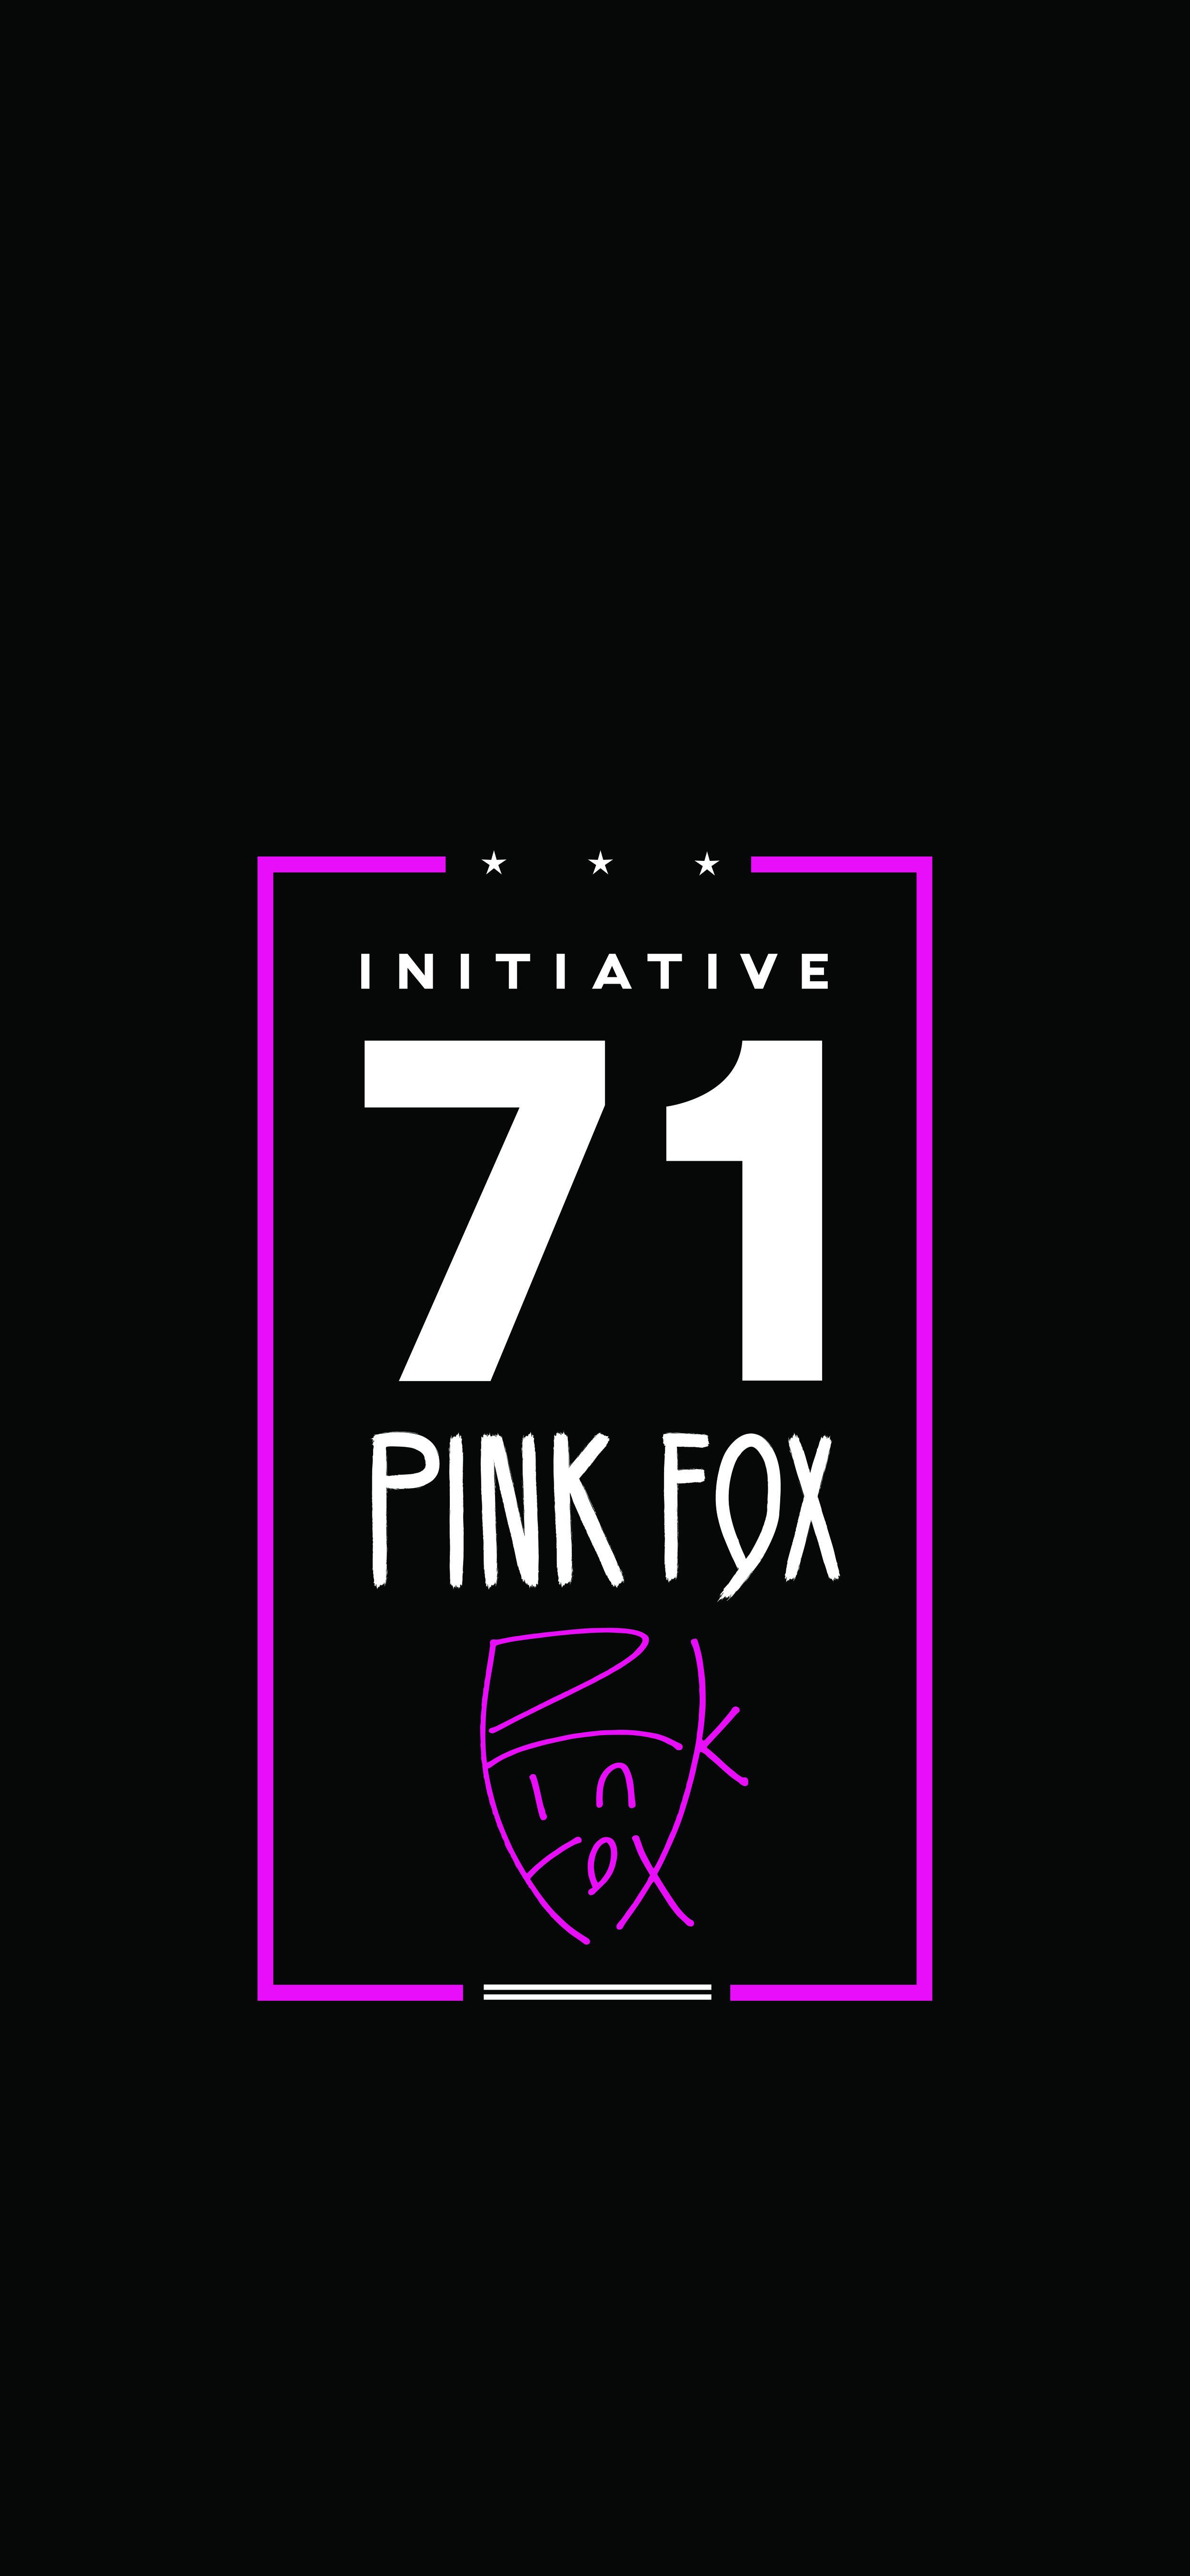 iPhone X BG - Initiative 711.jpg